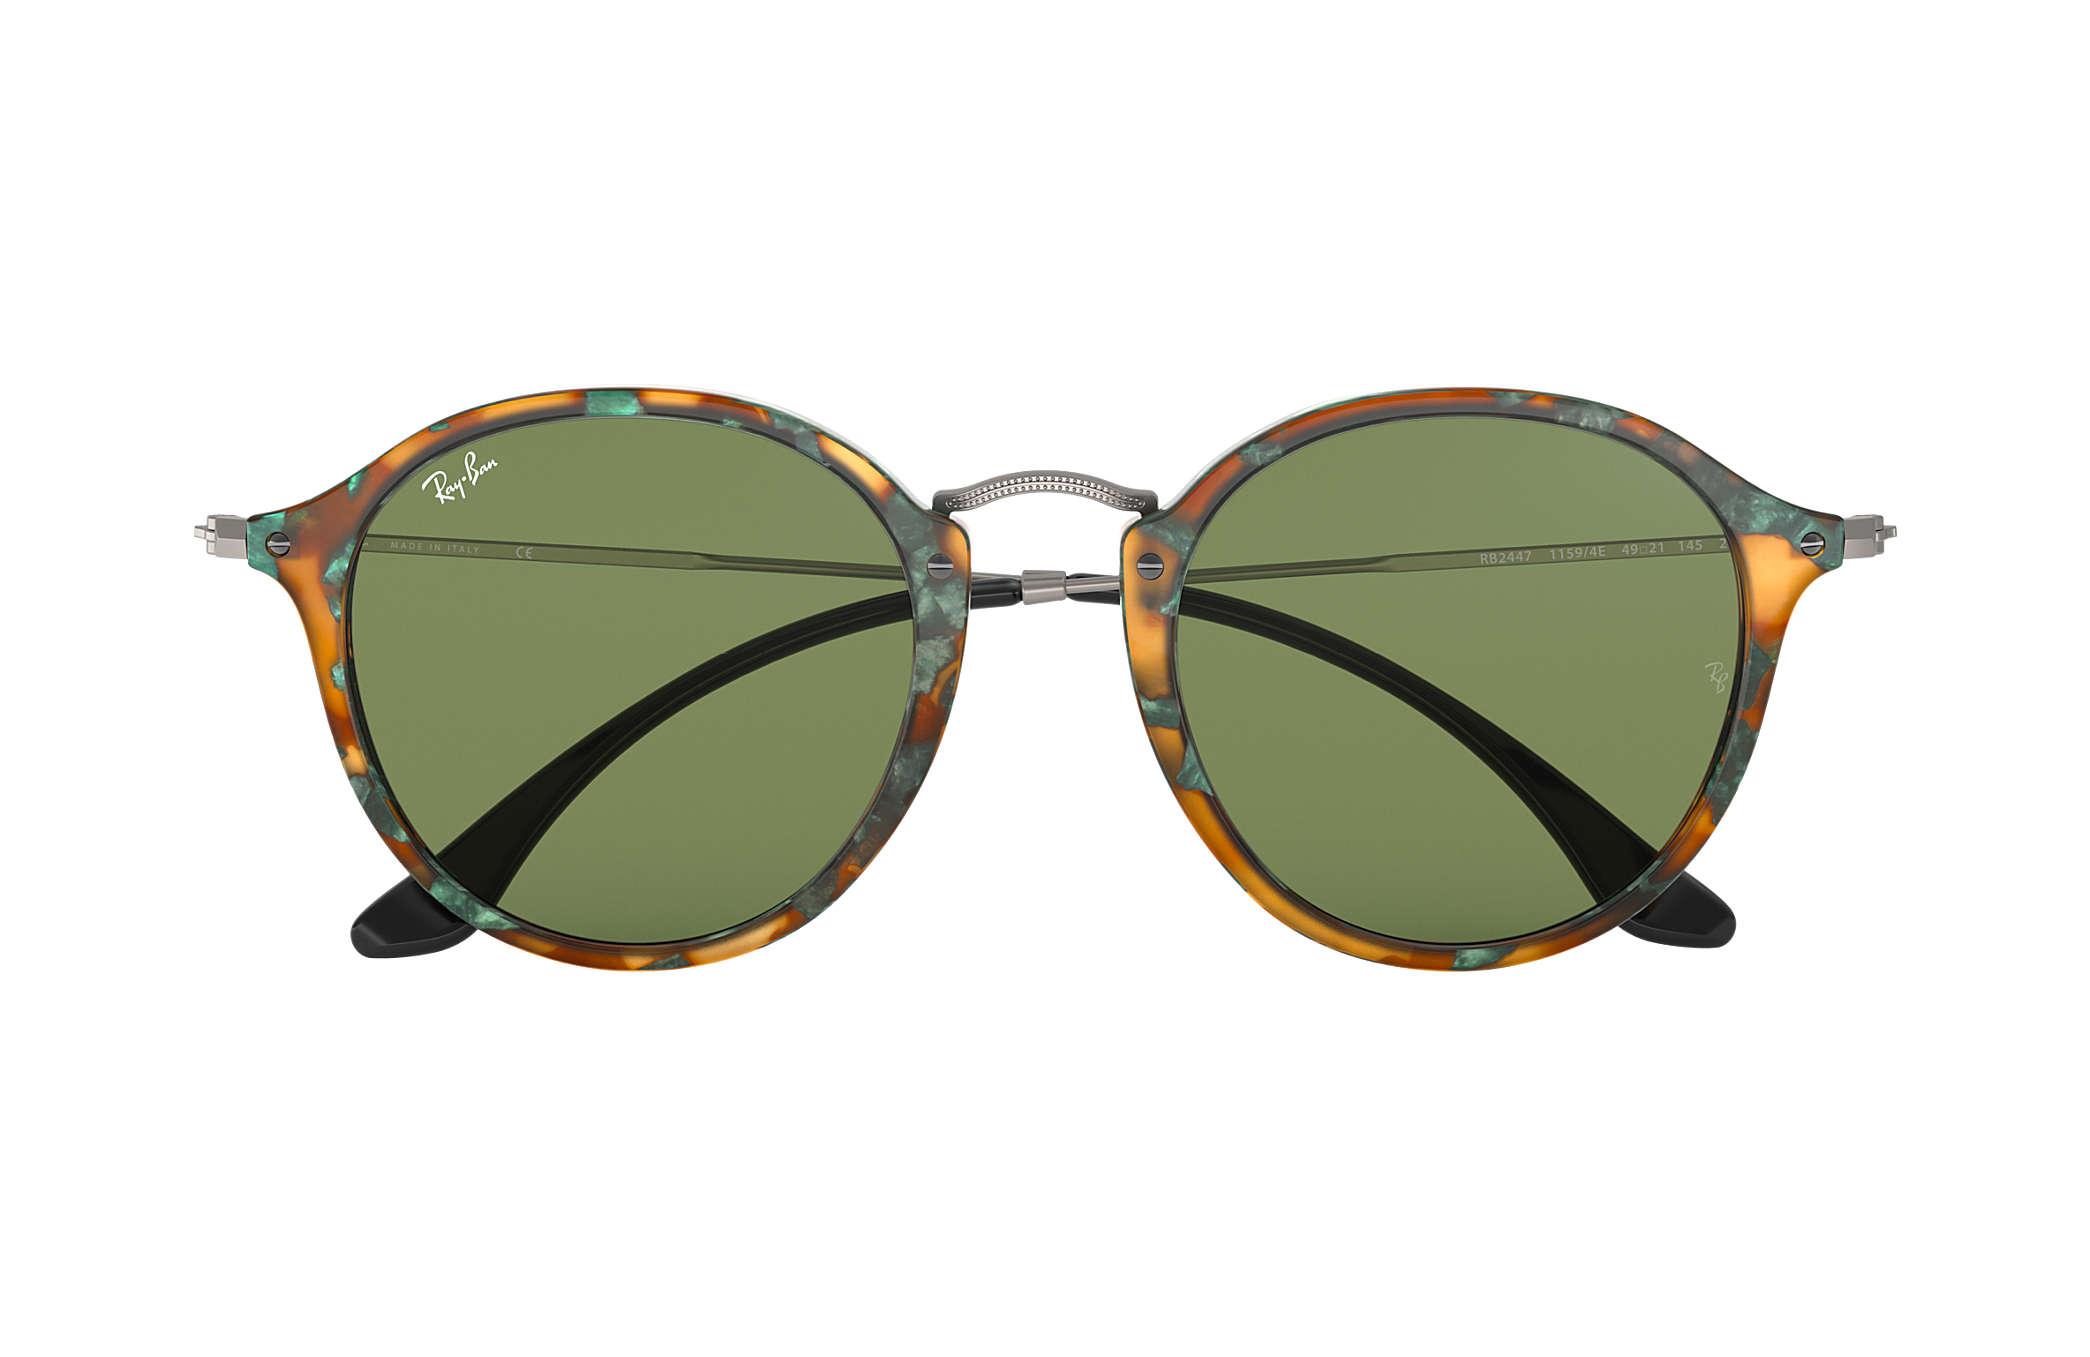 c8d85ef7690 Ray-Ban Round Fleck RB2447 Tortoise - Acetate - Green Lenses ...